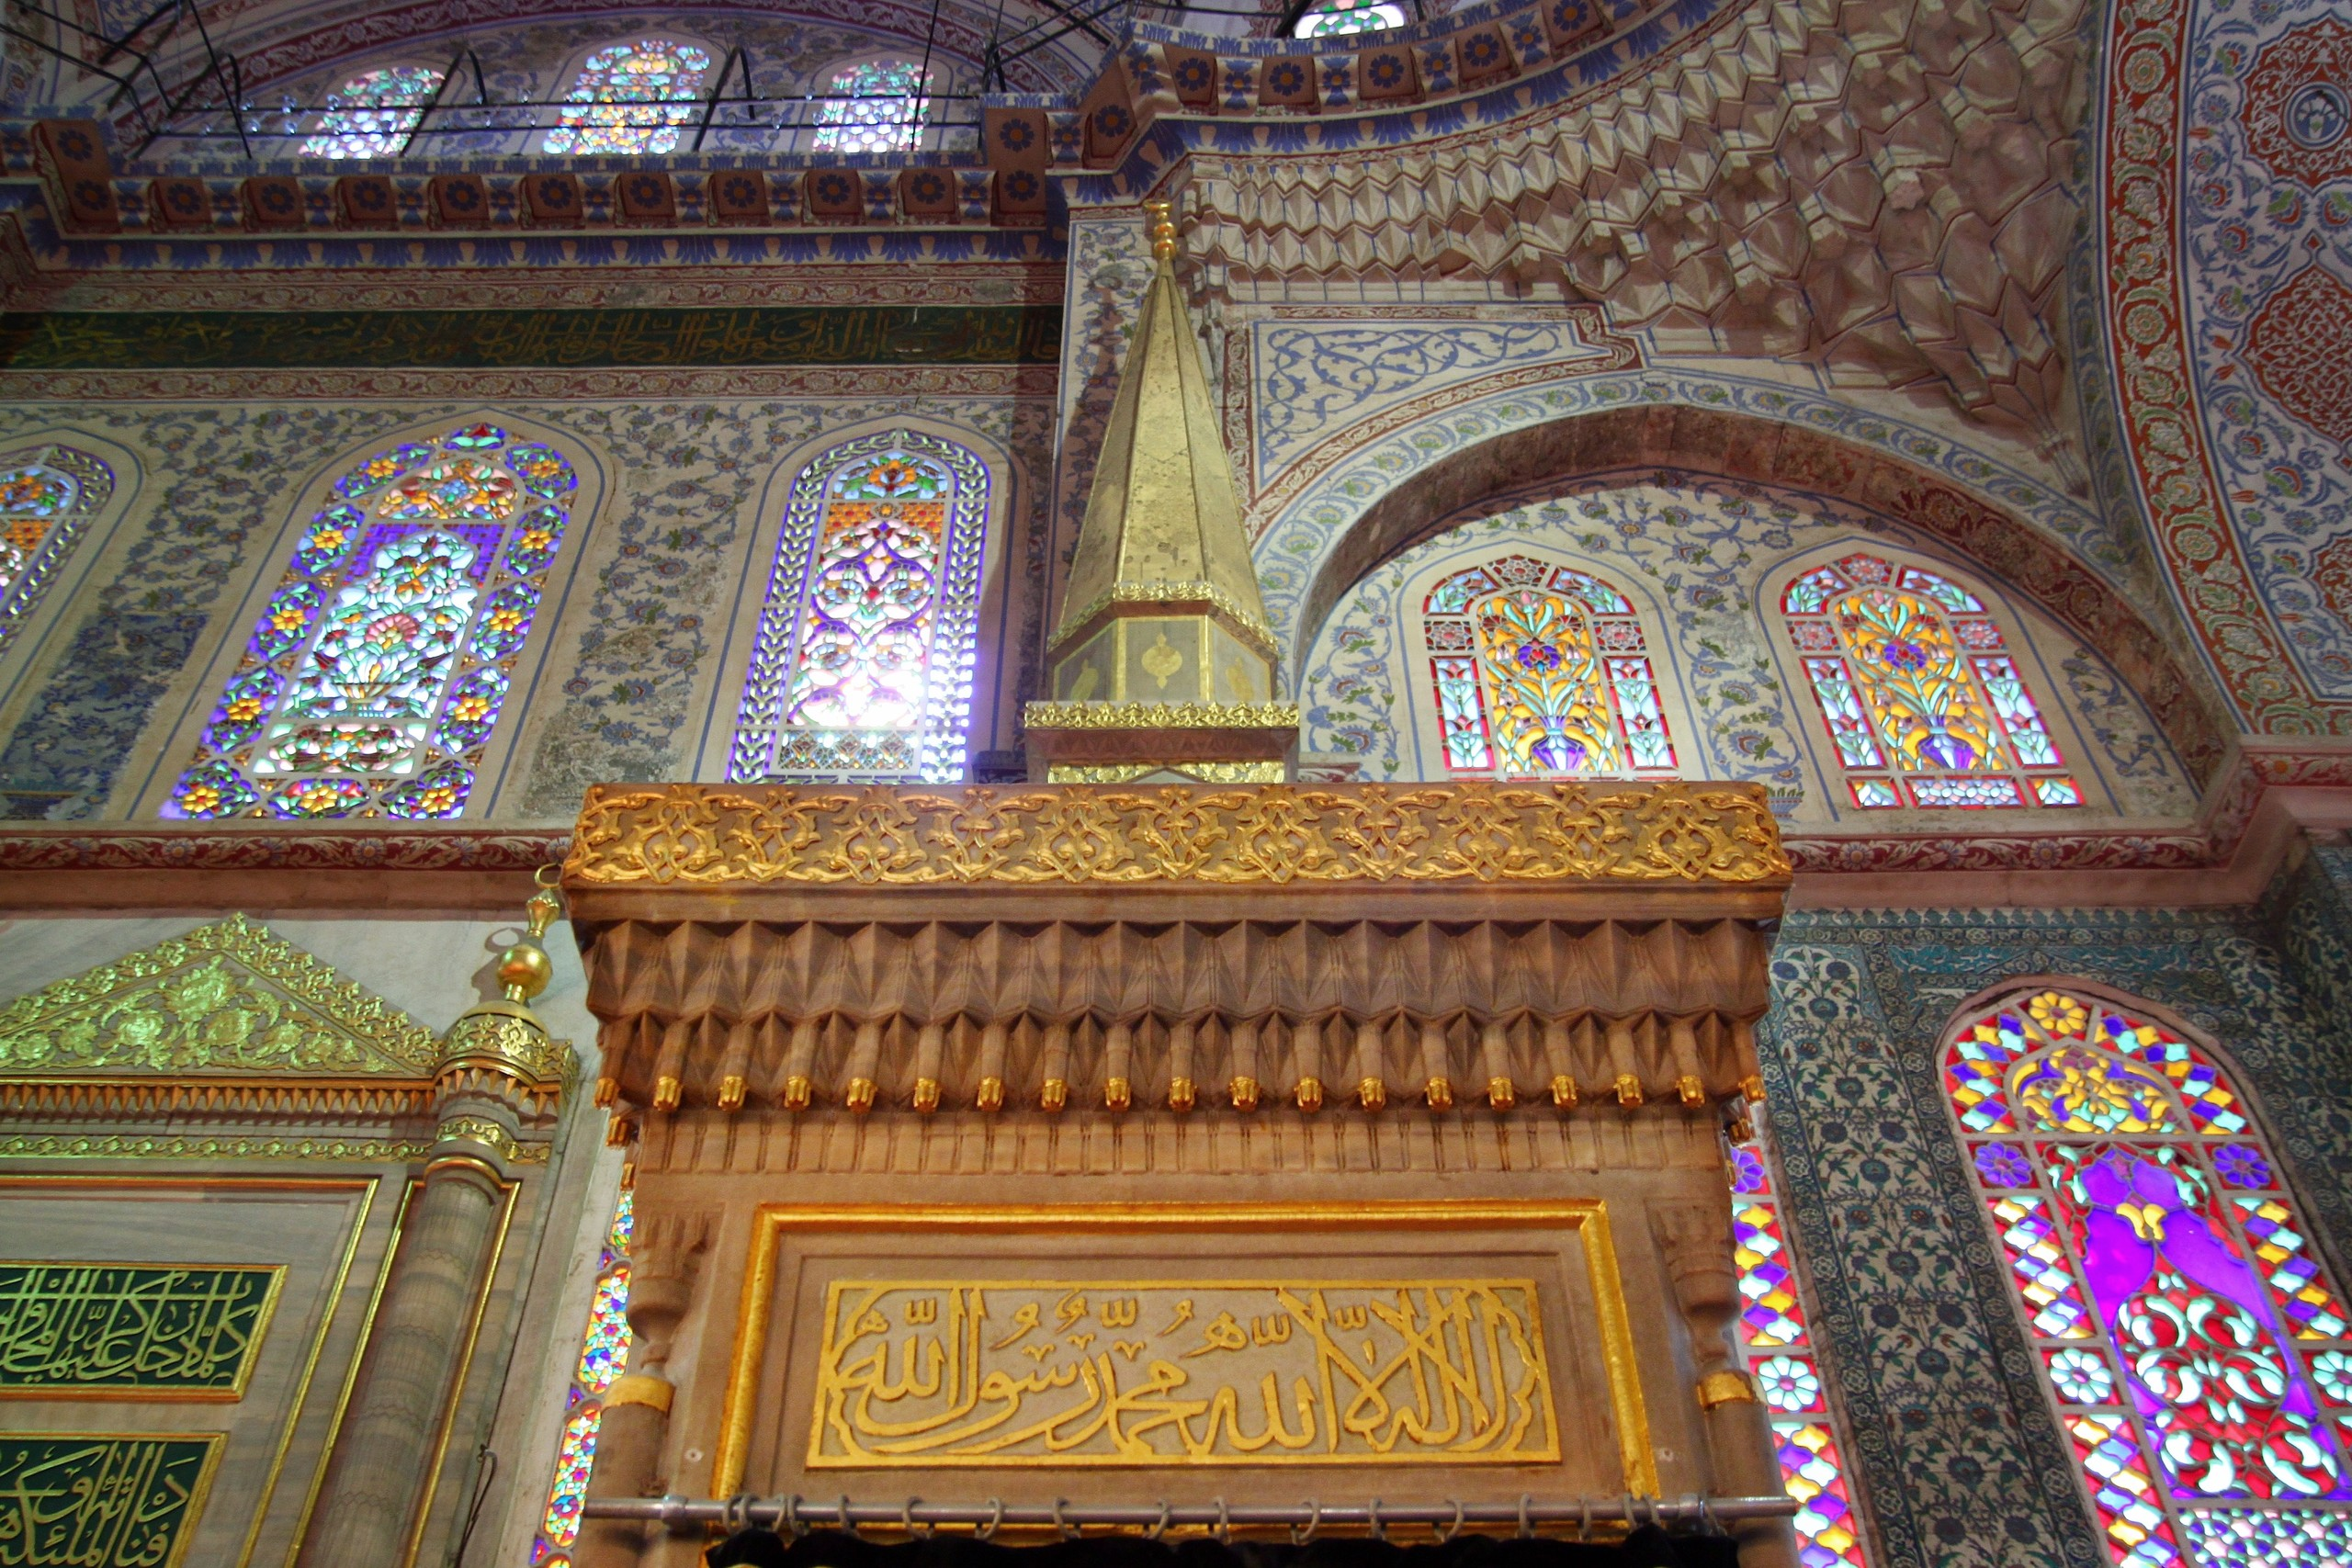 Pırlantadan Kubbeler #5: Sultanahmed - PM2Jqv - Pırlantadan Kubbeler #5: Sultanahmed